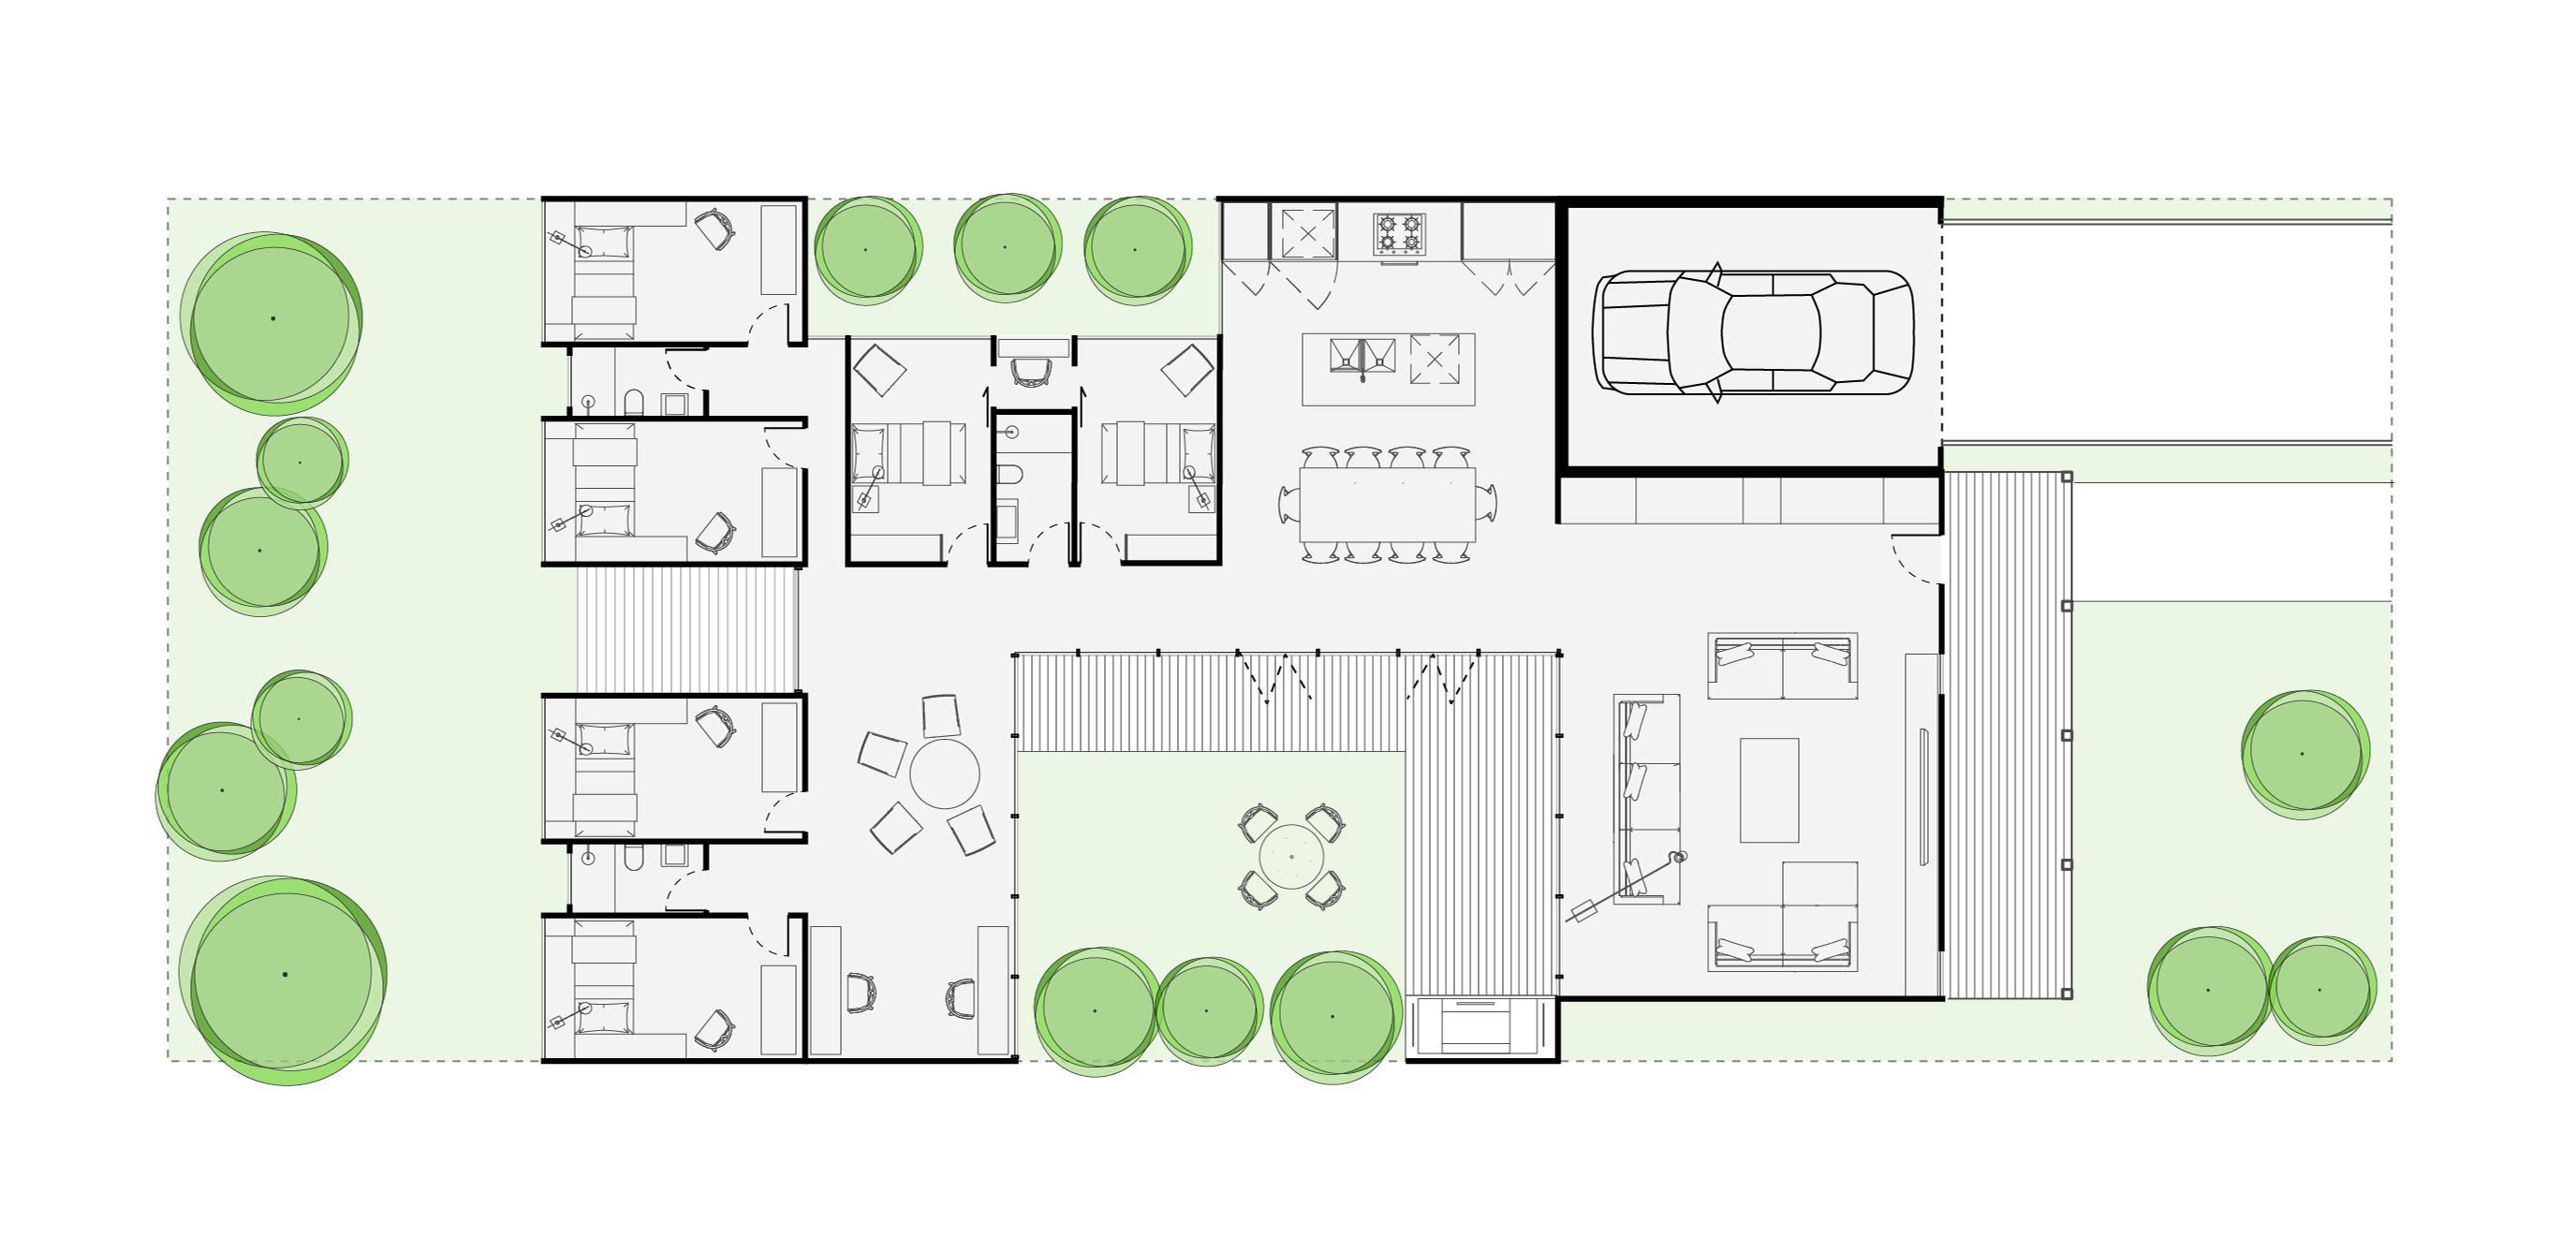 Kickstarter campaign urbancreative for Sustainable home design